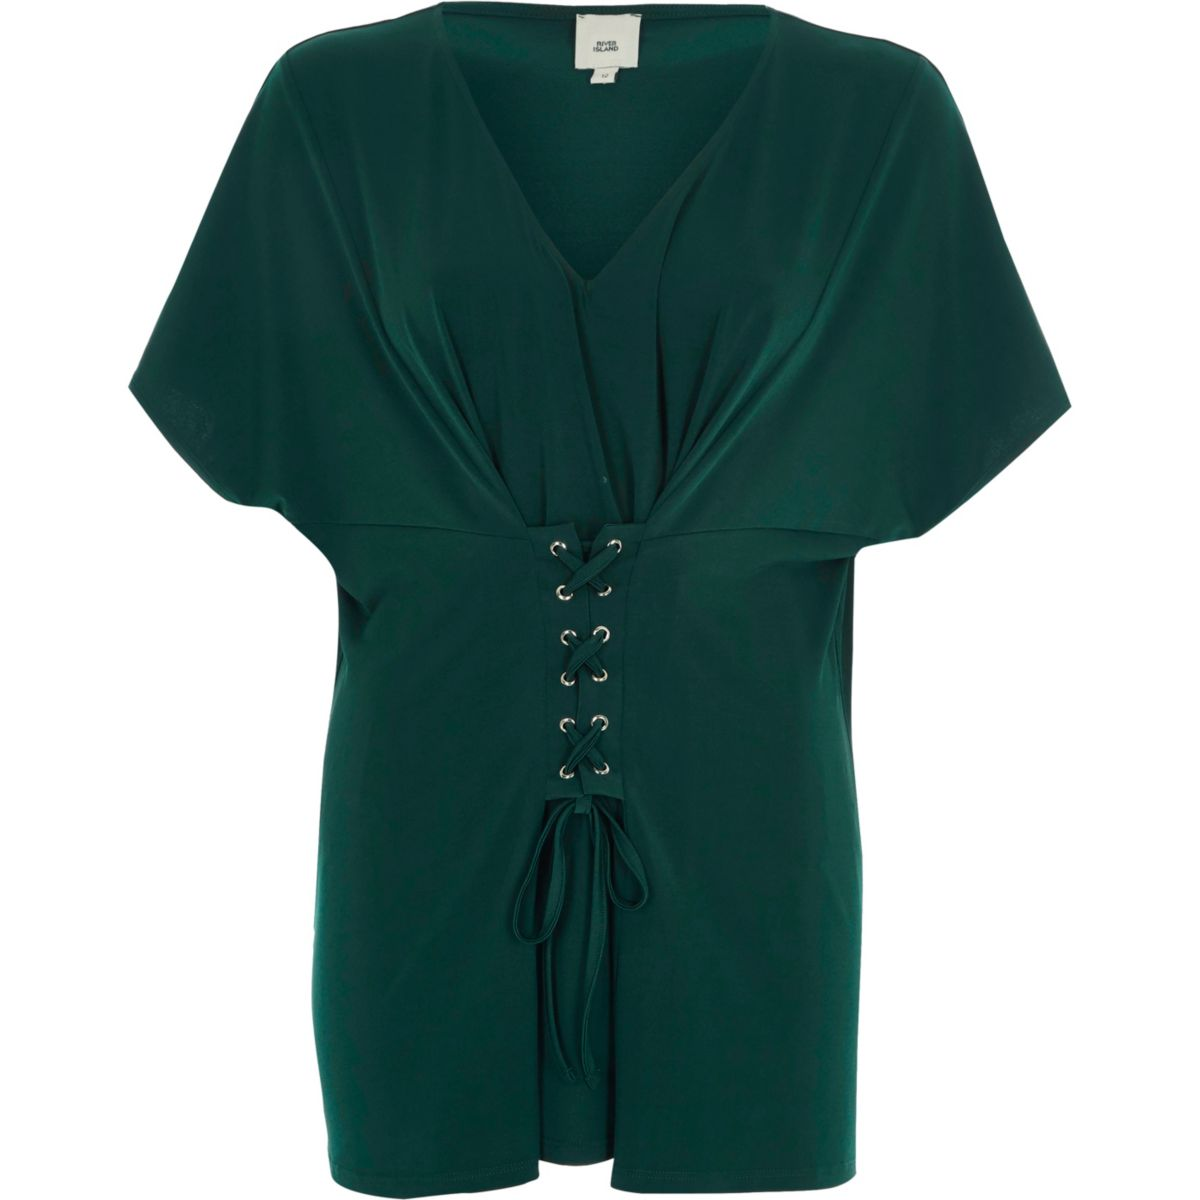 Green corset front V neck top